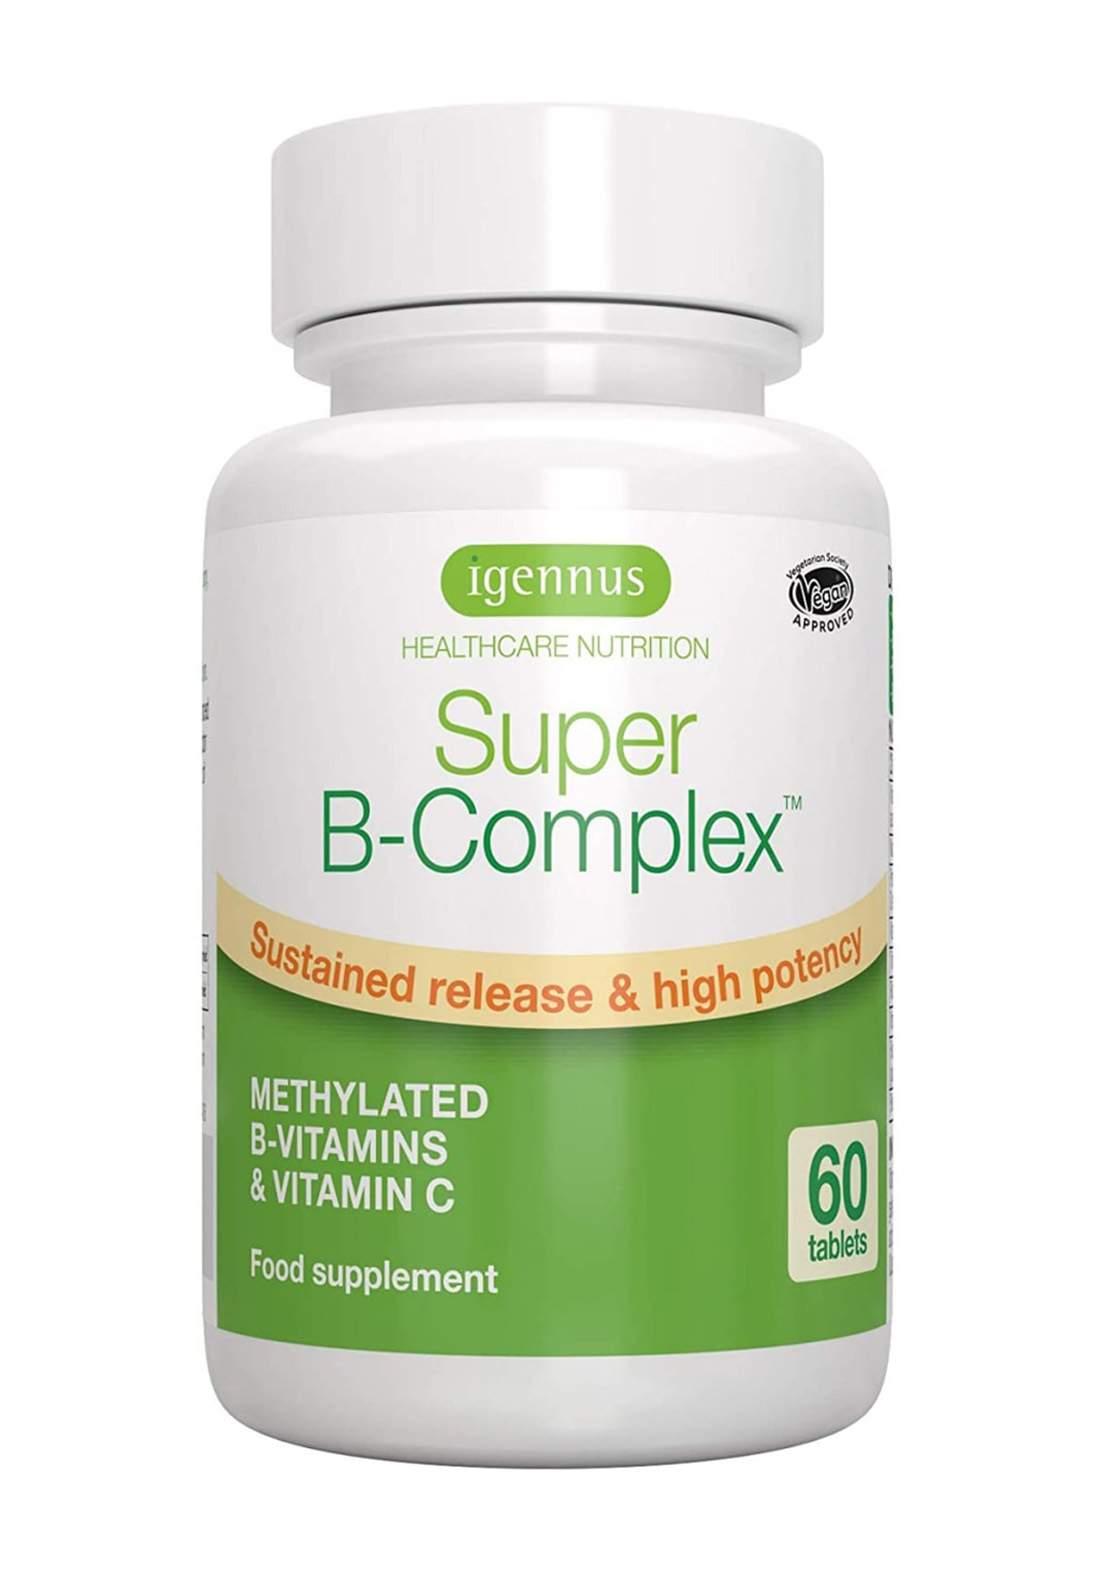 Igennus Health Care Nutrition Super B-Complex 60 Tablets مجموعة فيتامين بي المركب